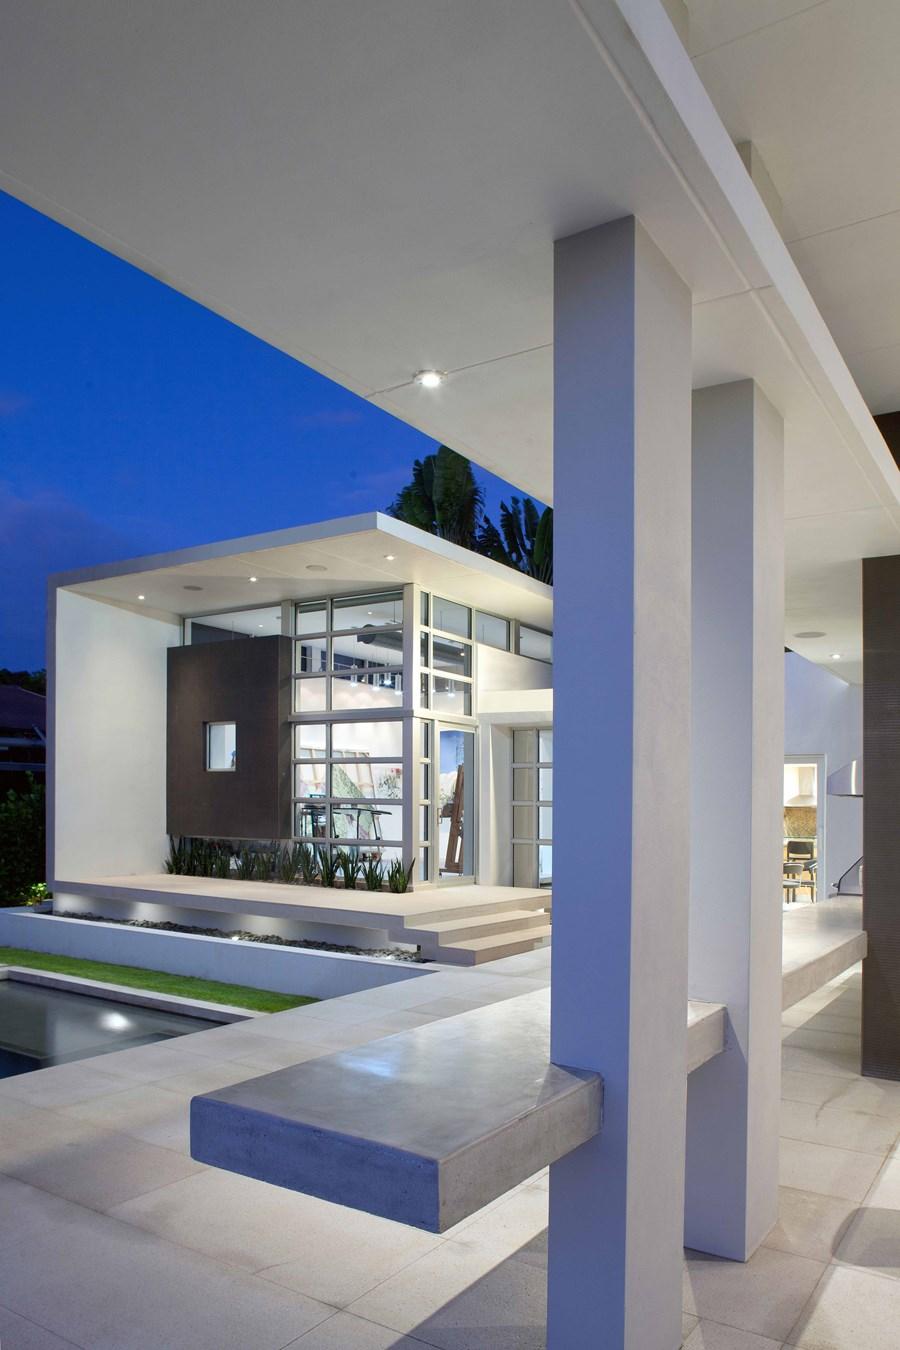 Lakewood Art Studio by KZ Architecture 25